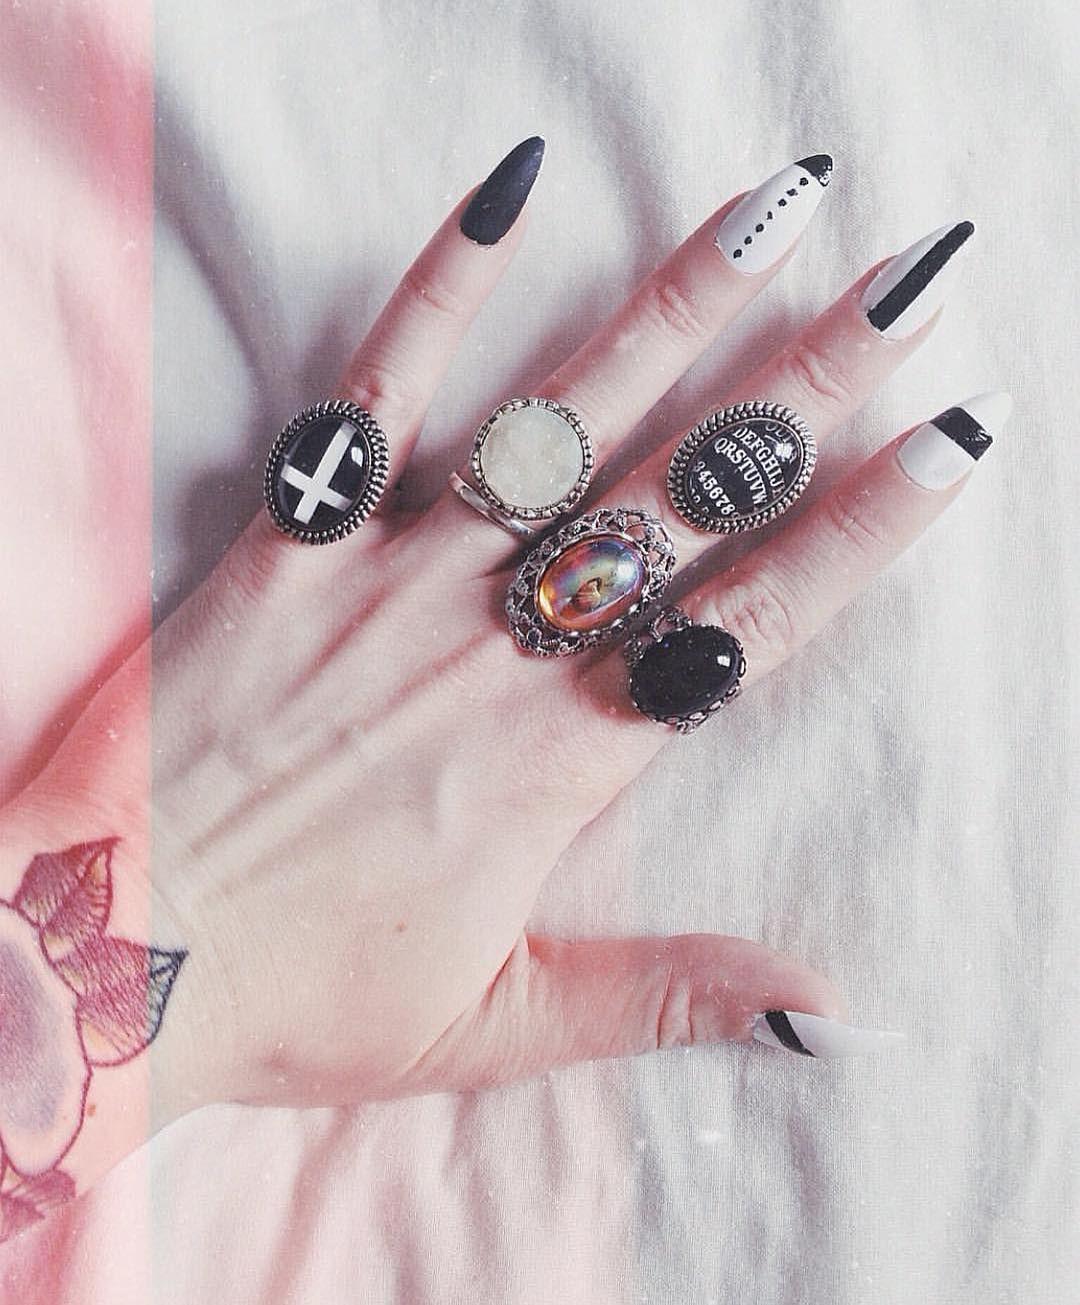 Creepy Cool Nail Art Inspiration Source Instagram #NailArt #Stiletto ...